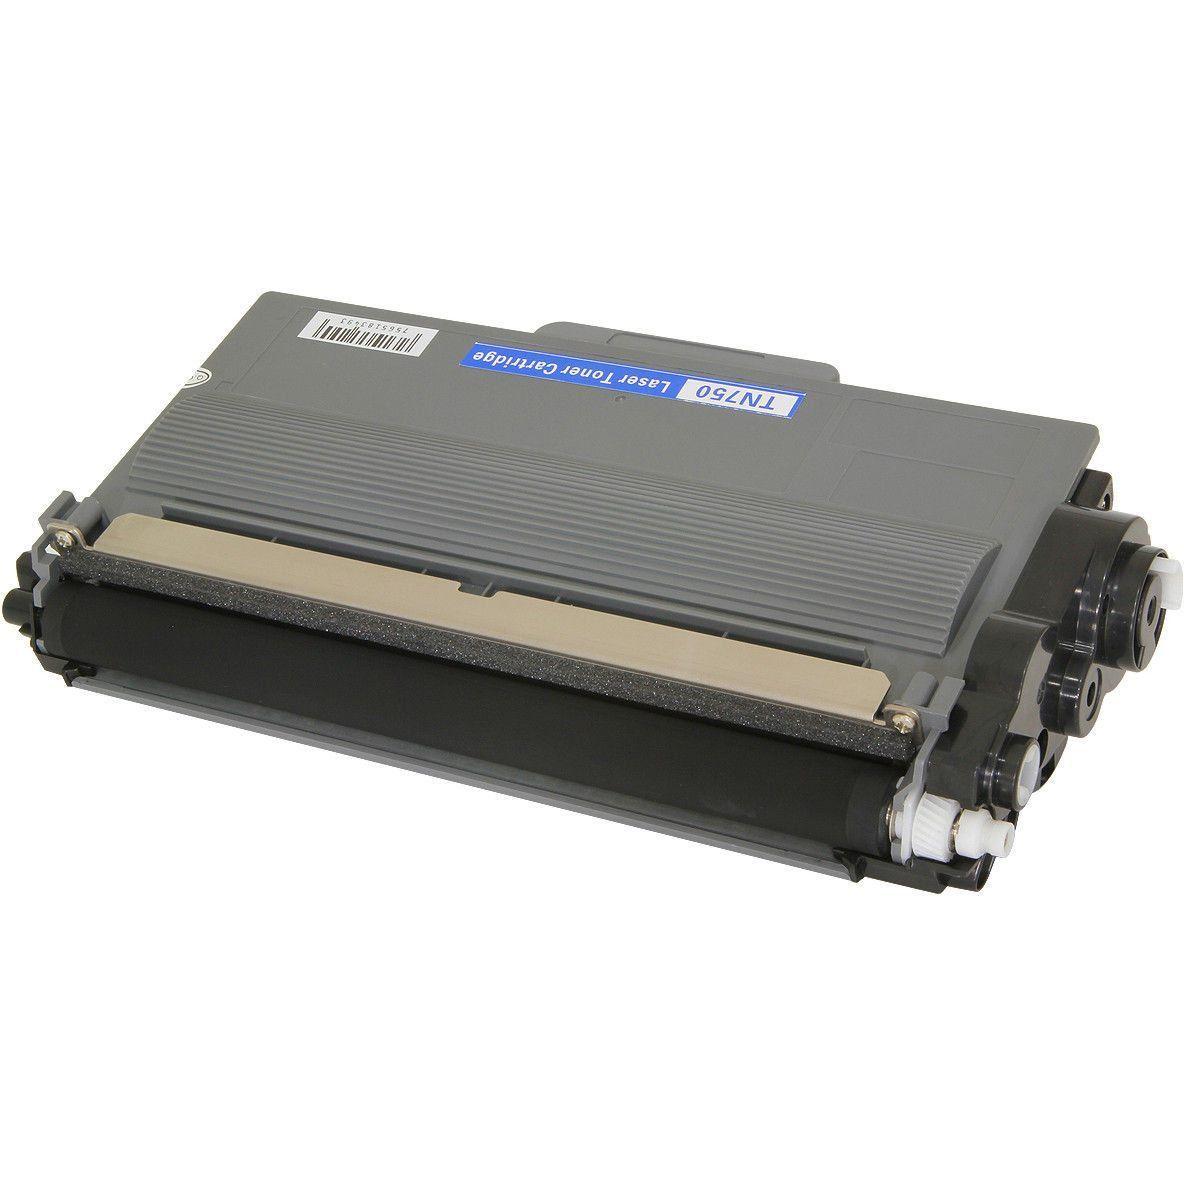 Compatível: Toner TN750 TN720 TN3382 para Brother HL-5472 HL-6182 DCP-8110 DCP-8112 DCP-8155 MFC-8912 / Preto / 8.000